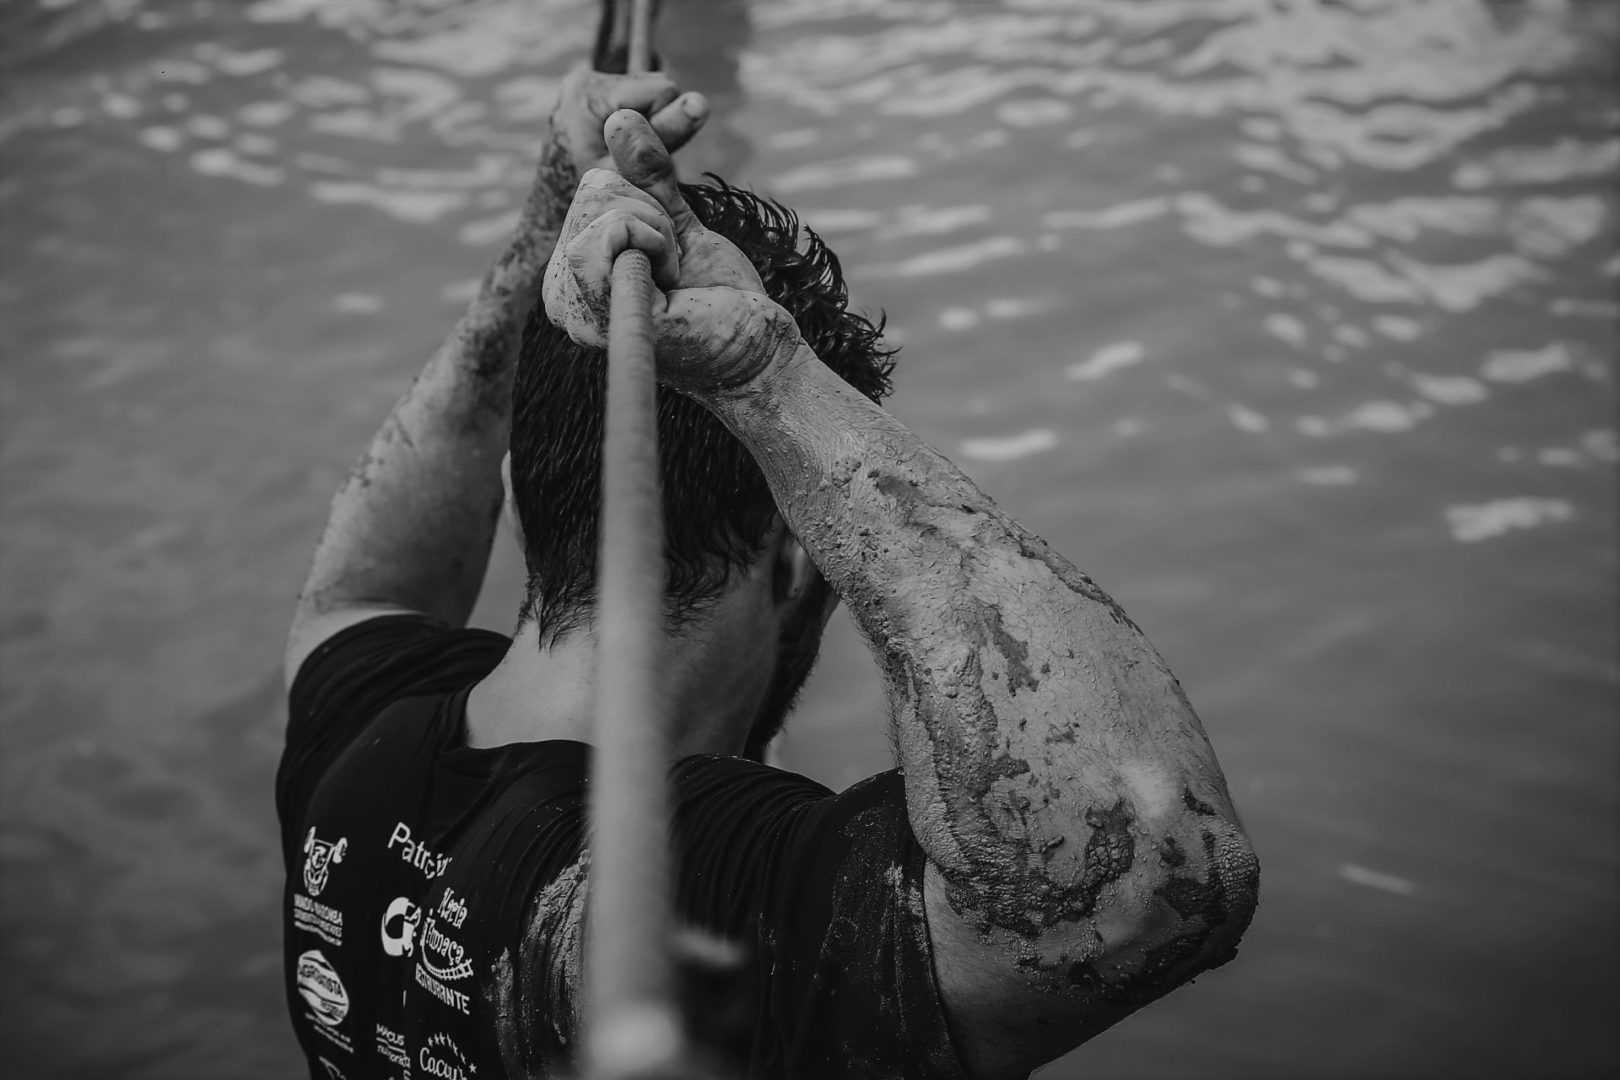 Homme qui tient une corde